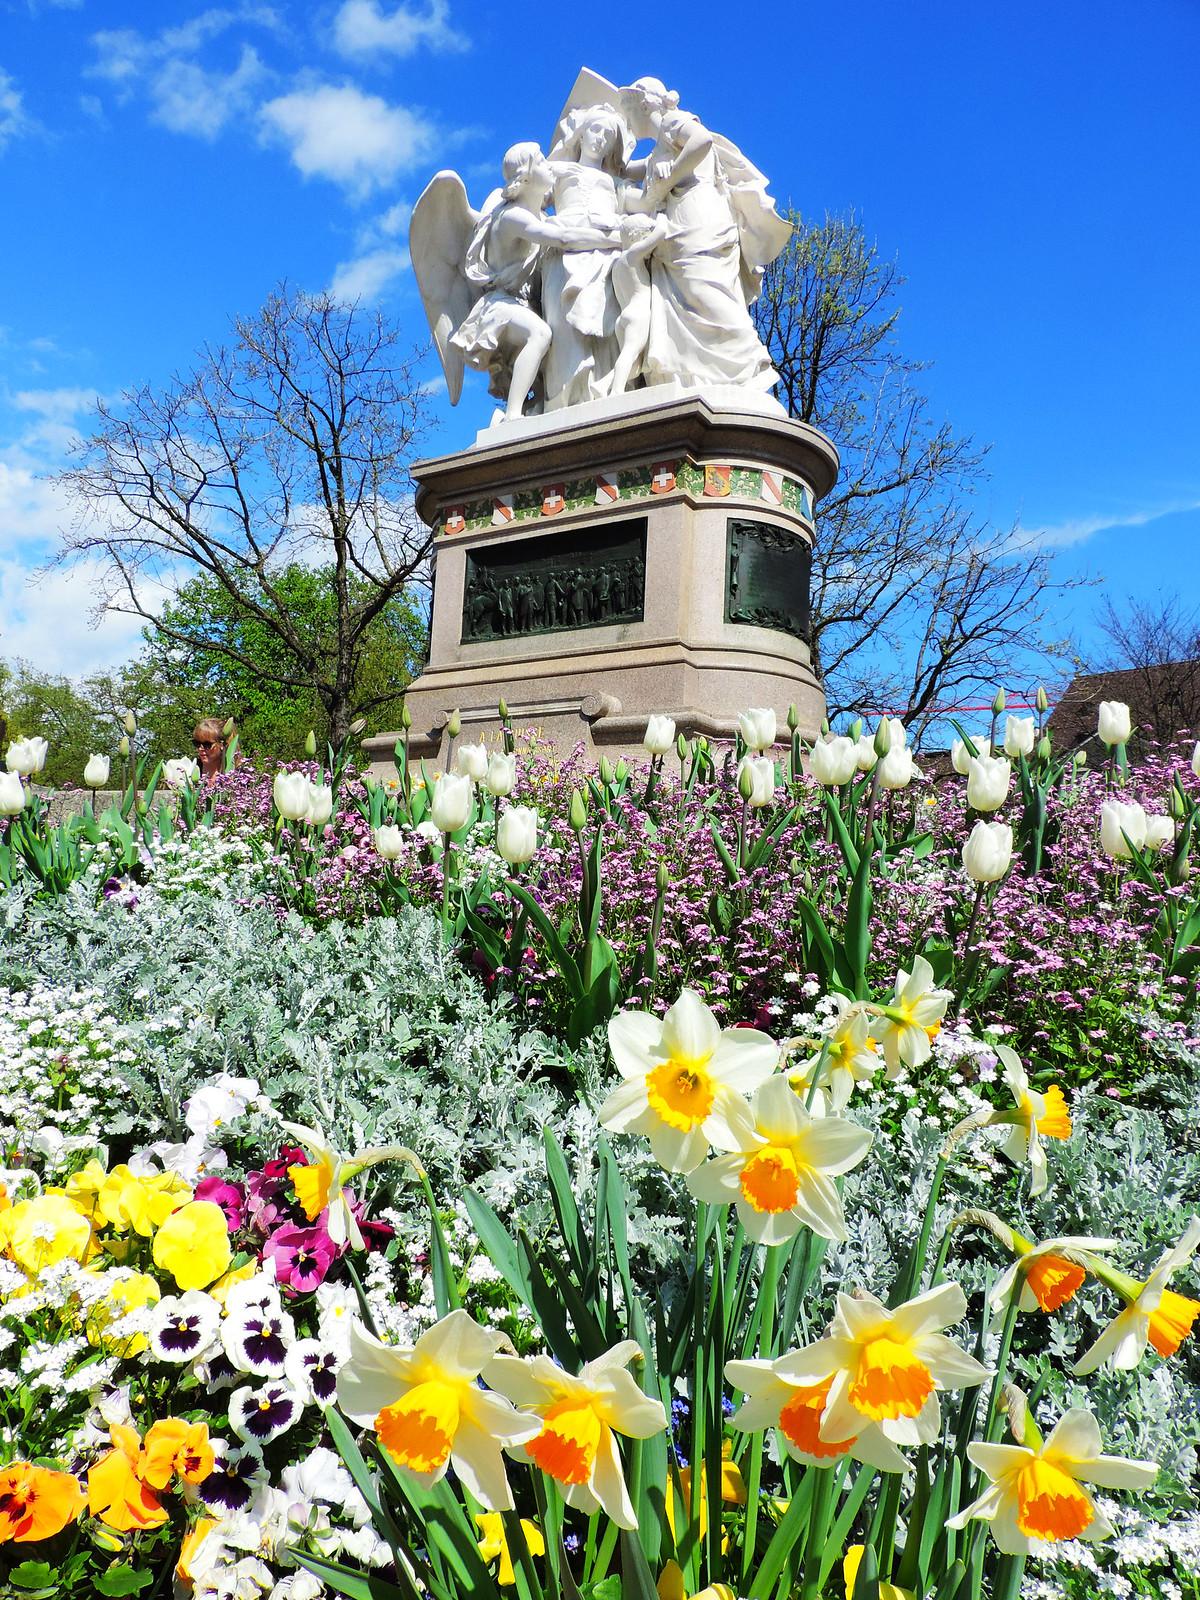 Festival Of Flowers: Basel, Switzerland